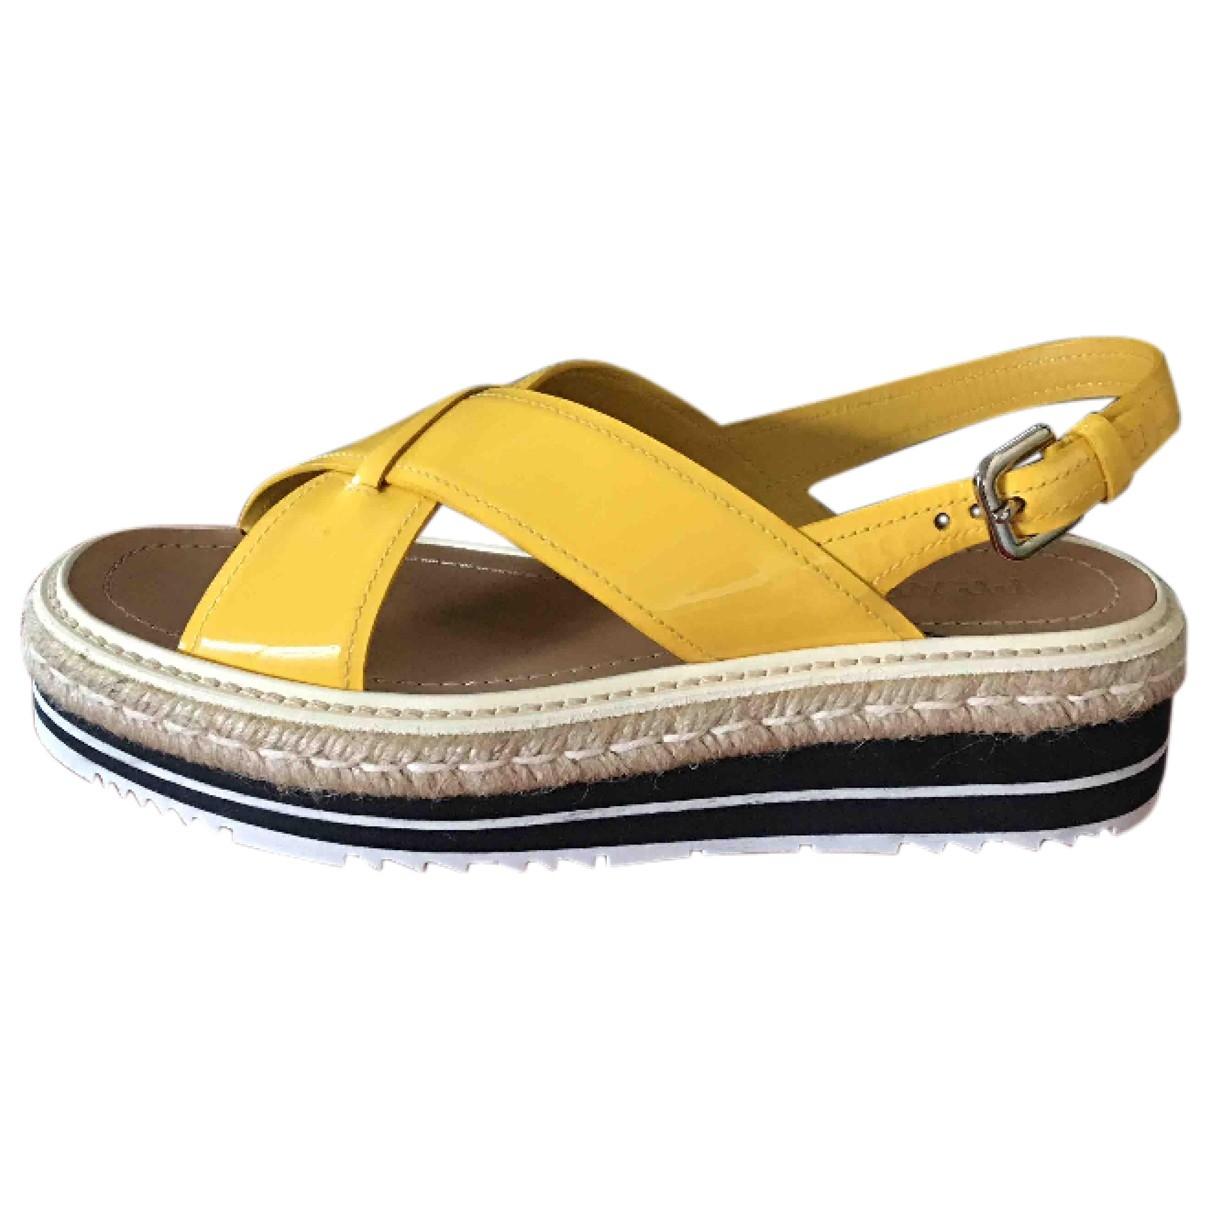 Prada \N Yellow Leather Sandals for Women 40 EU